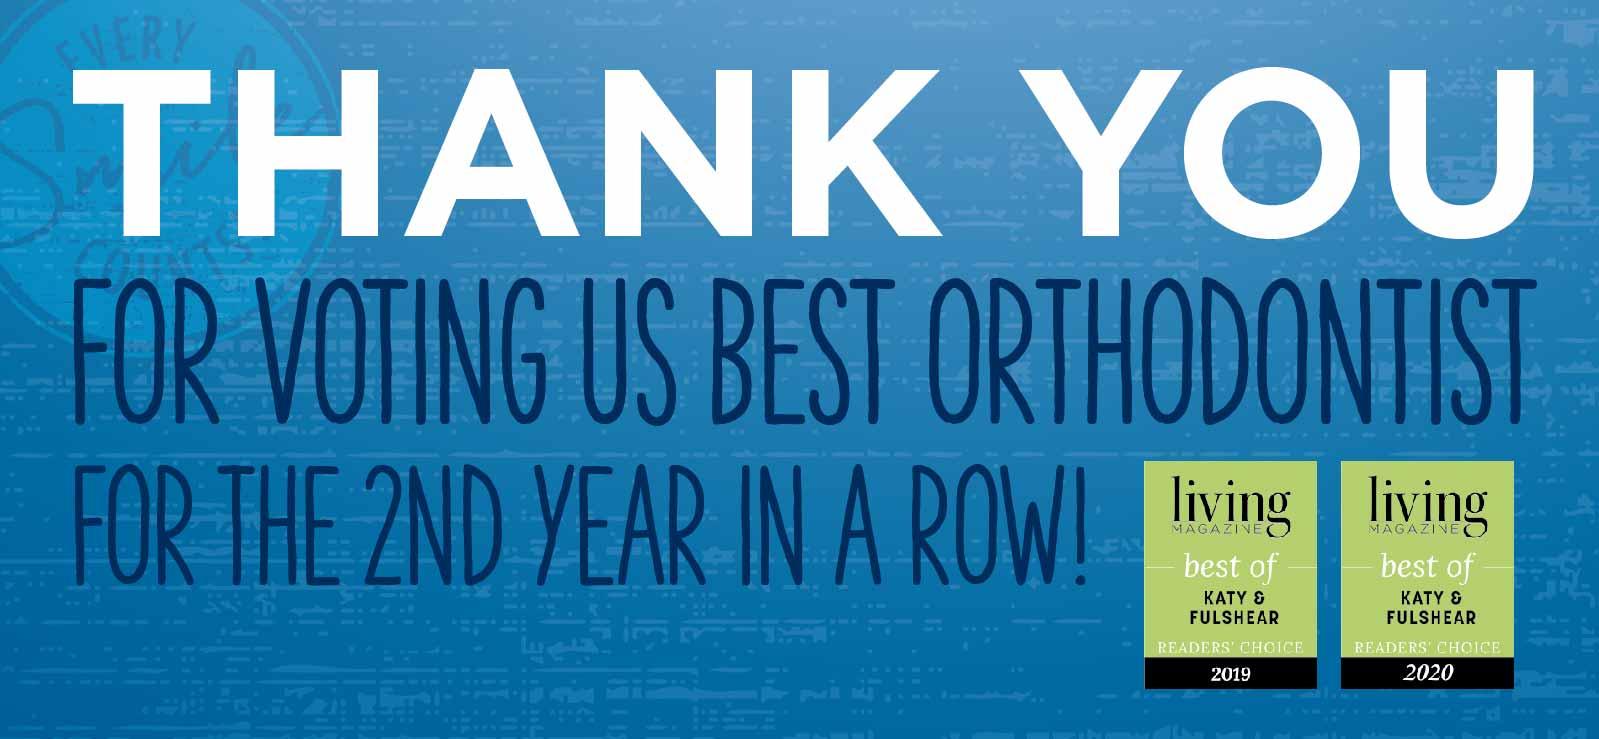 best orthodontist katy